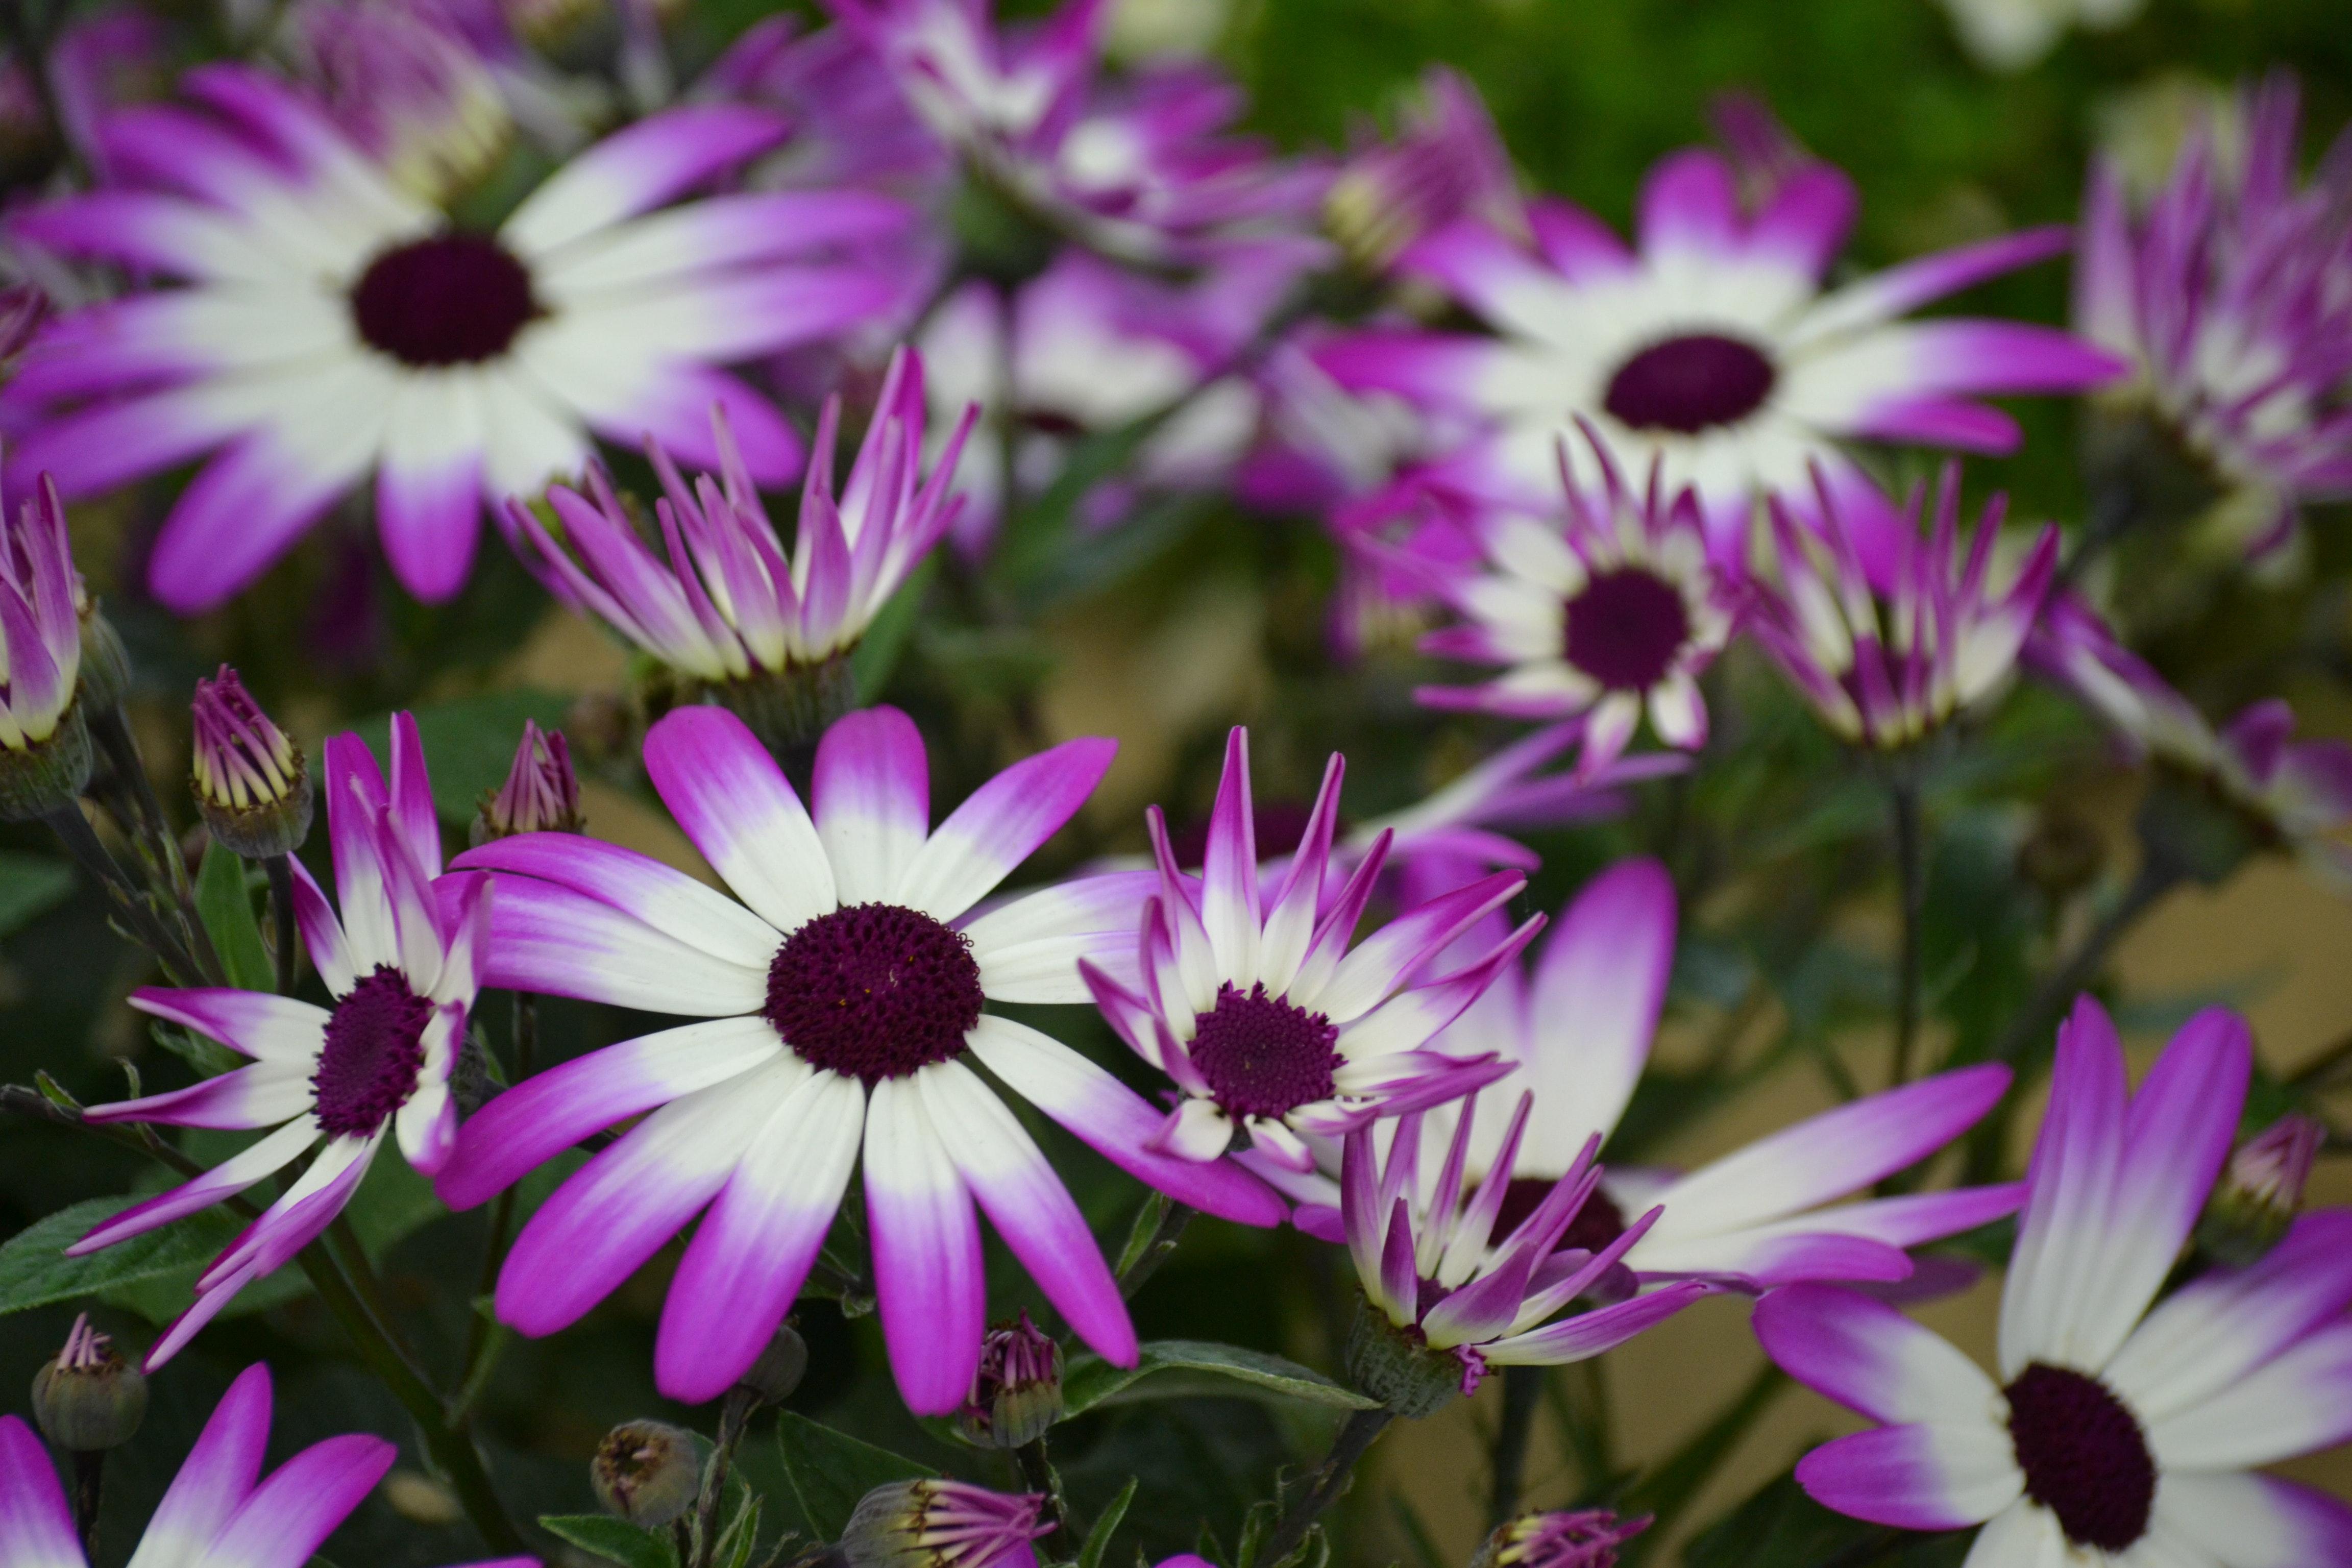 Purple flowers pexels free stock photos fetching more photos mightylinksfo